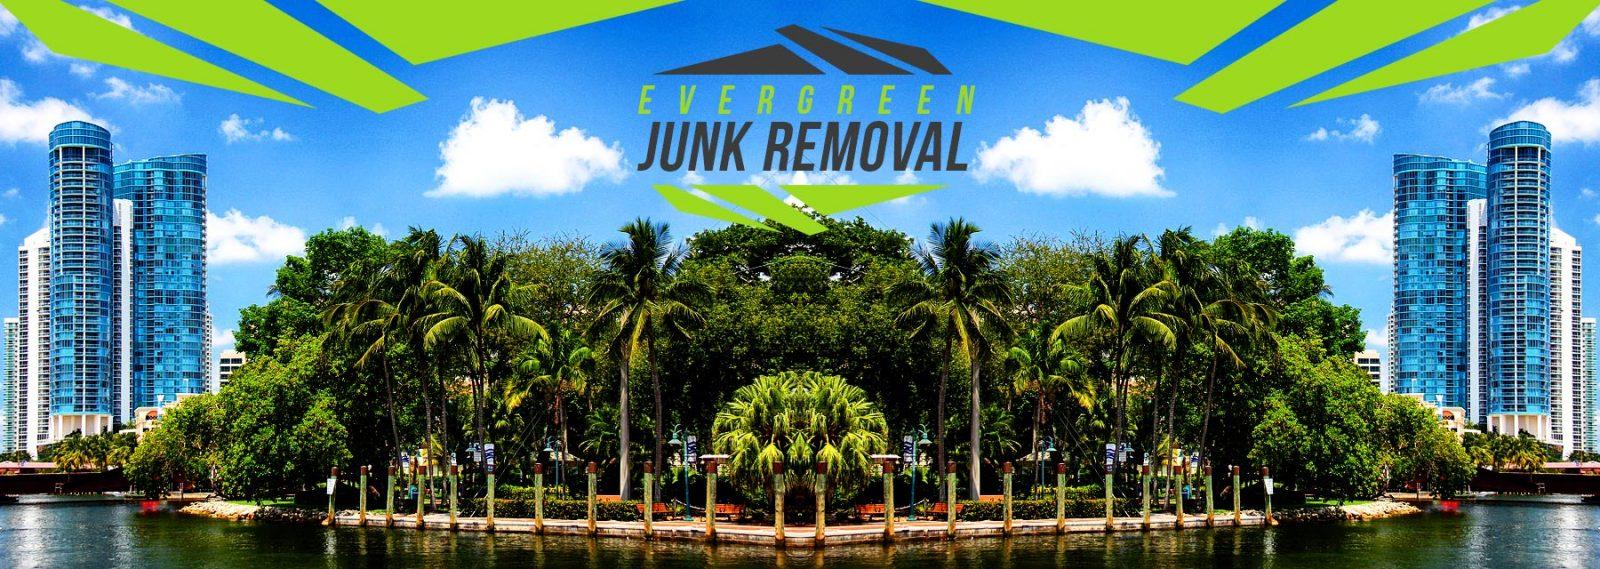 Orlando Hot Tub Removal Company